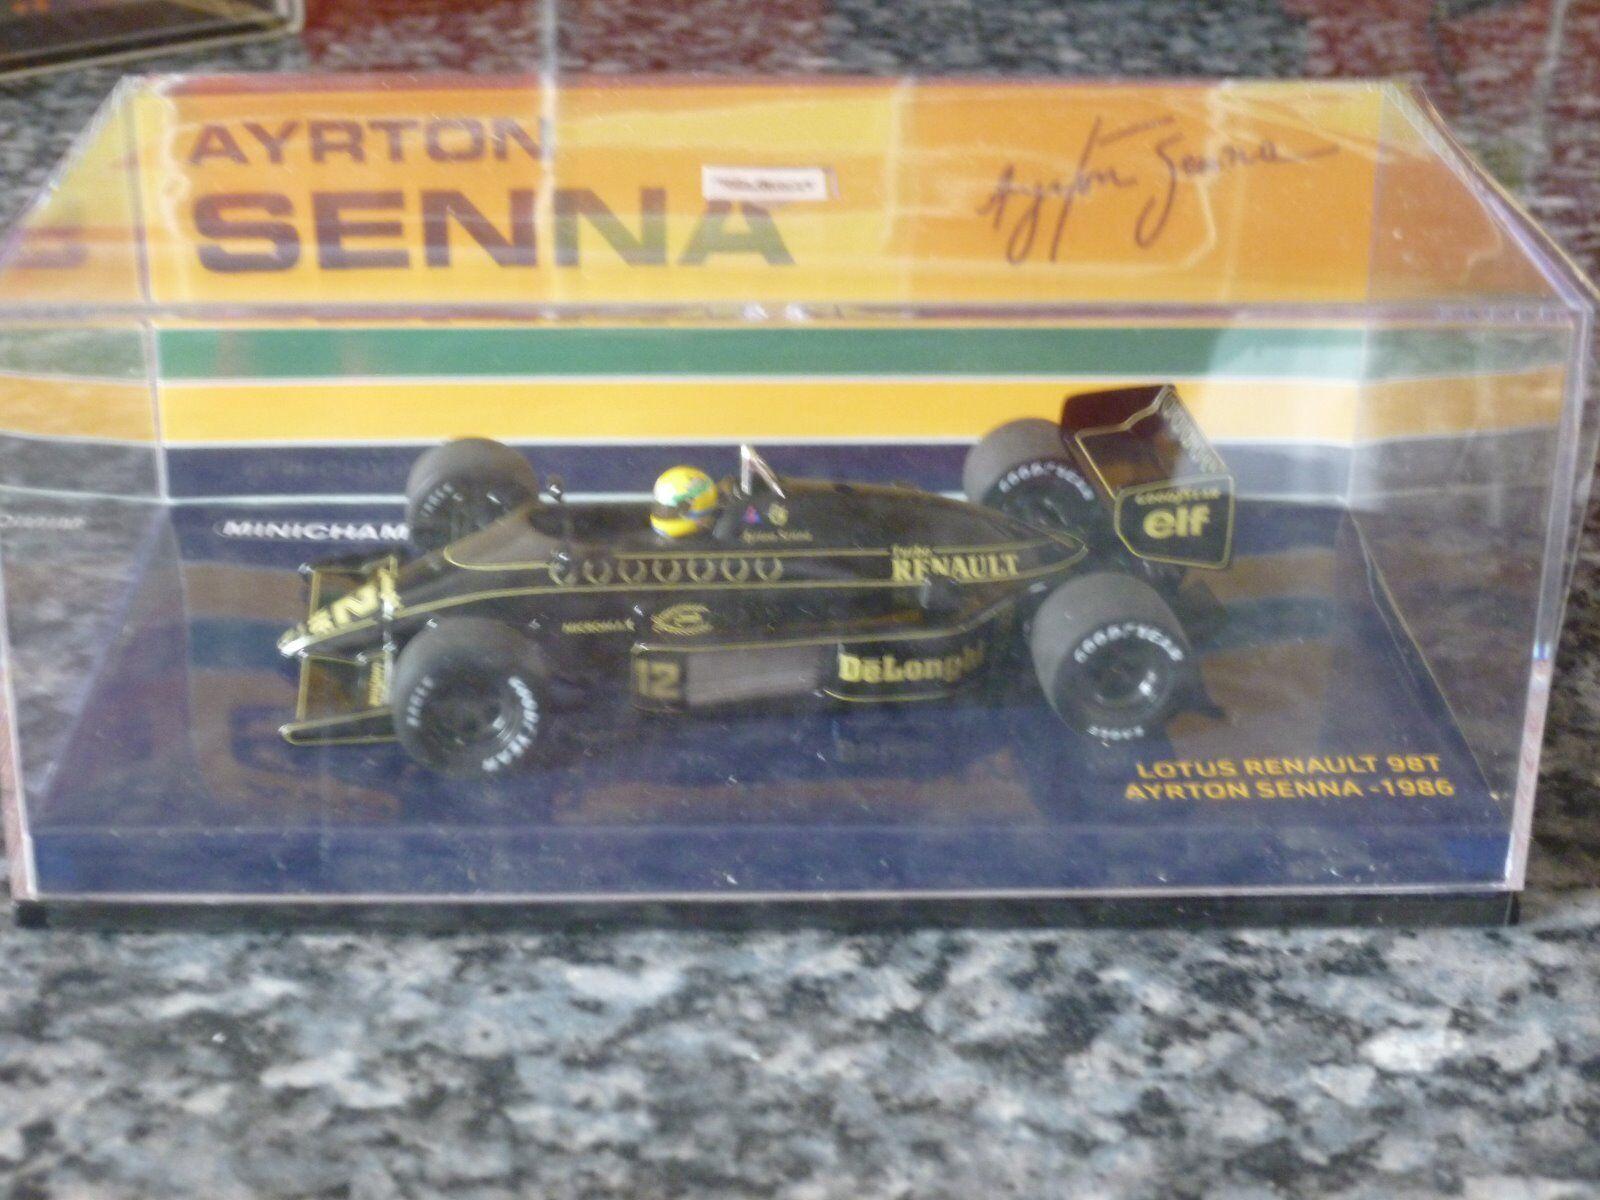 MINICHAMPS Lotus Renault 98T 1986 Ayrton Senna 1 43